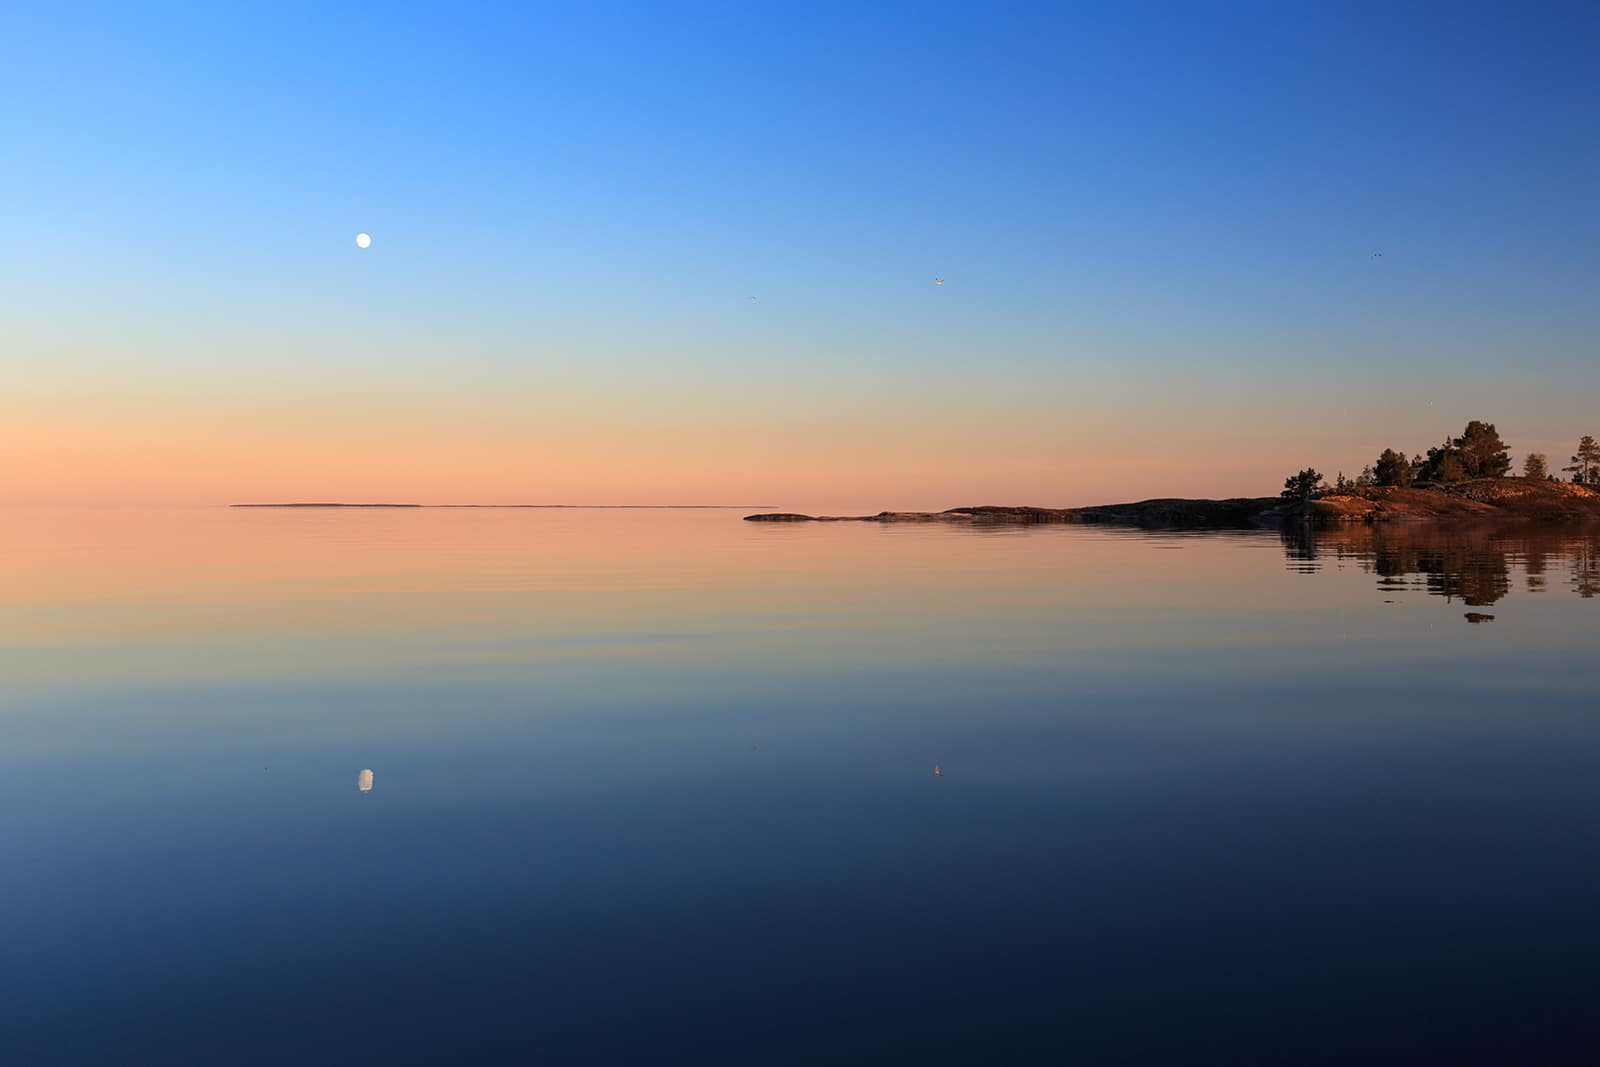 Landscape of silence